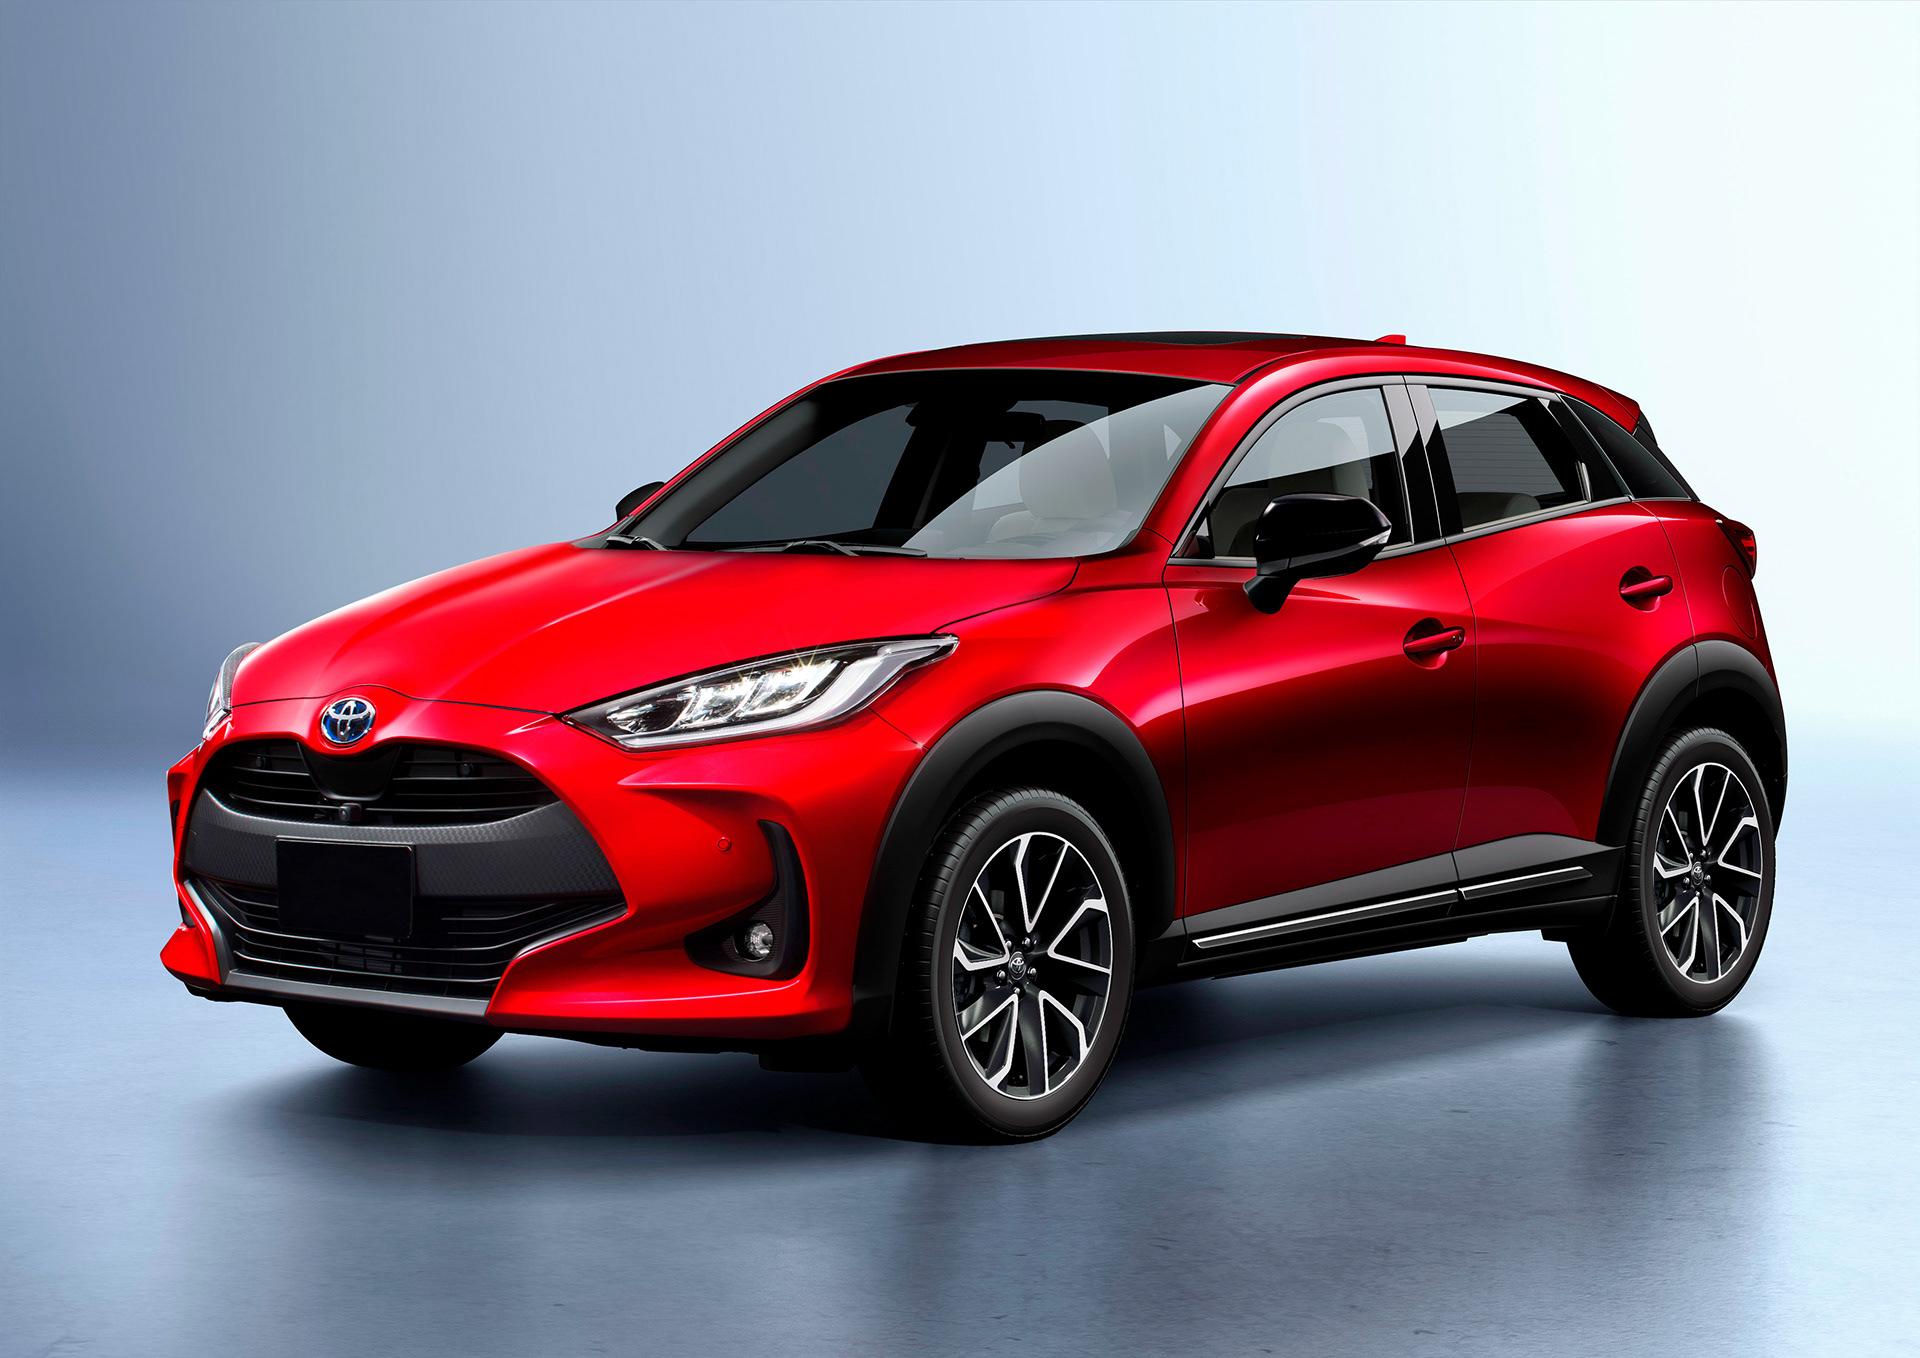 Kelebihan Crossover Toyota Spesifikasi